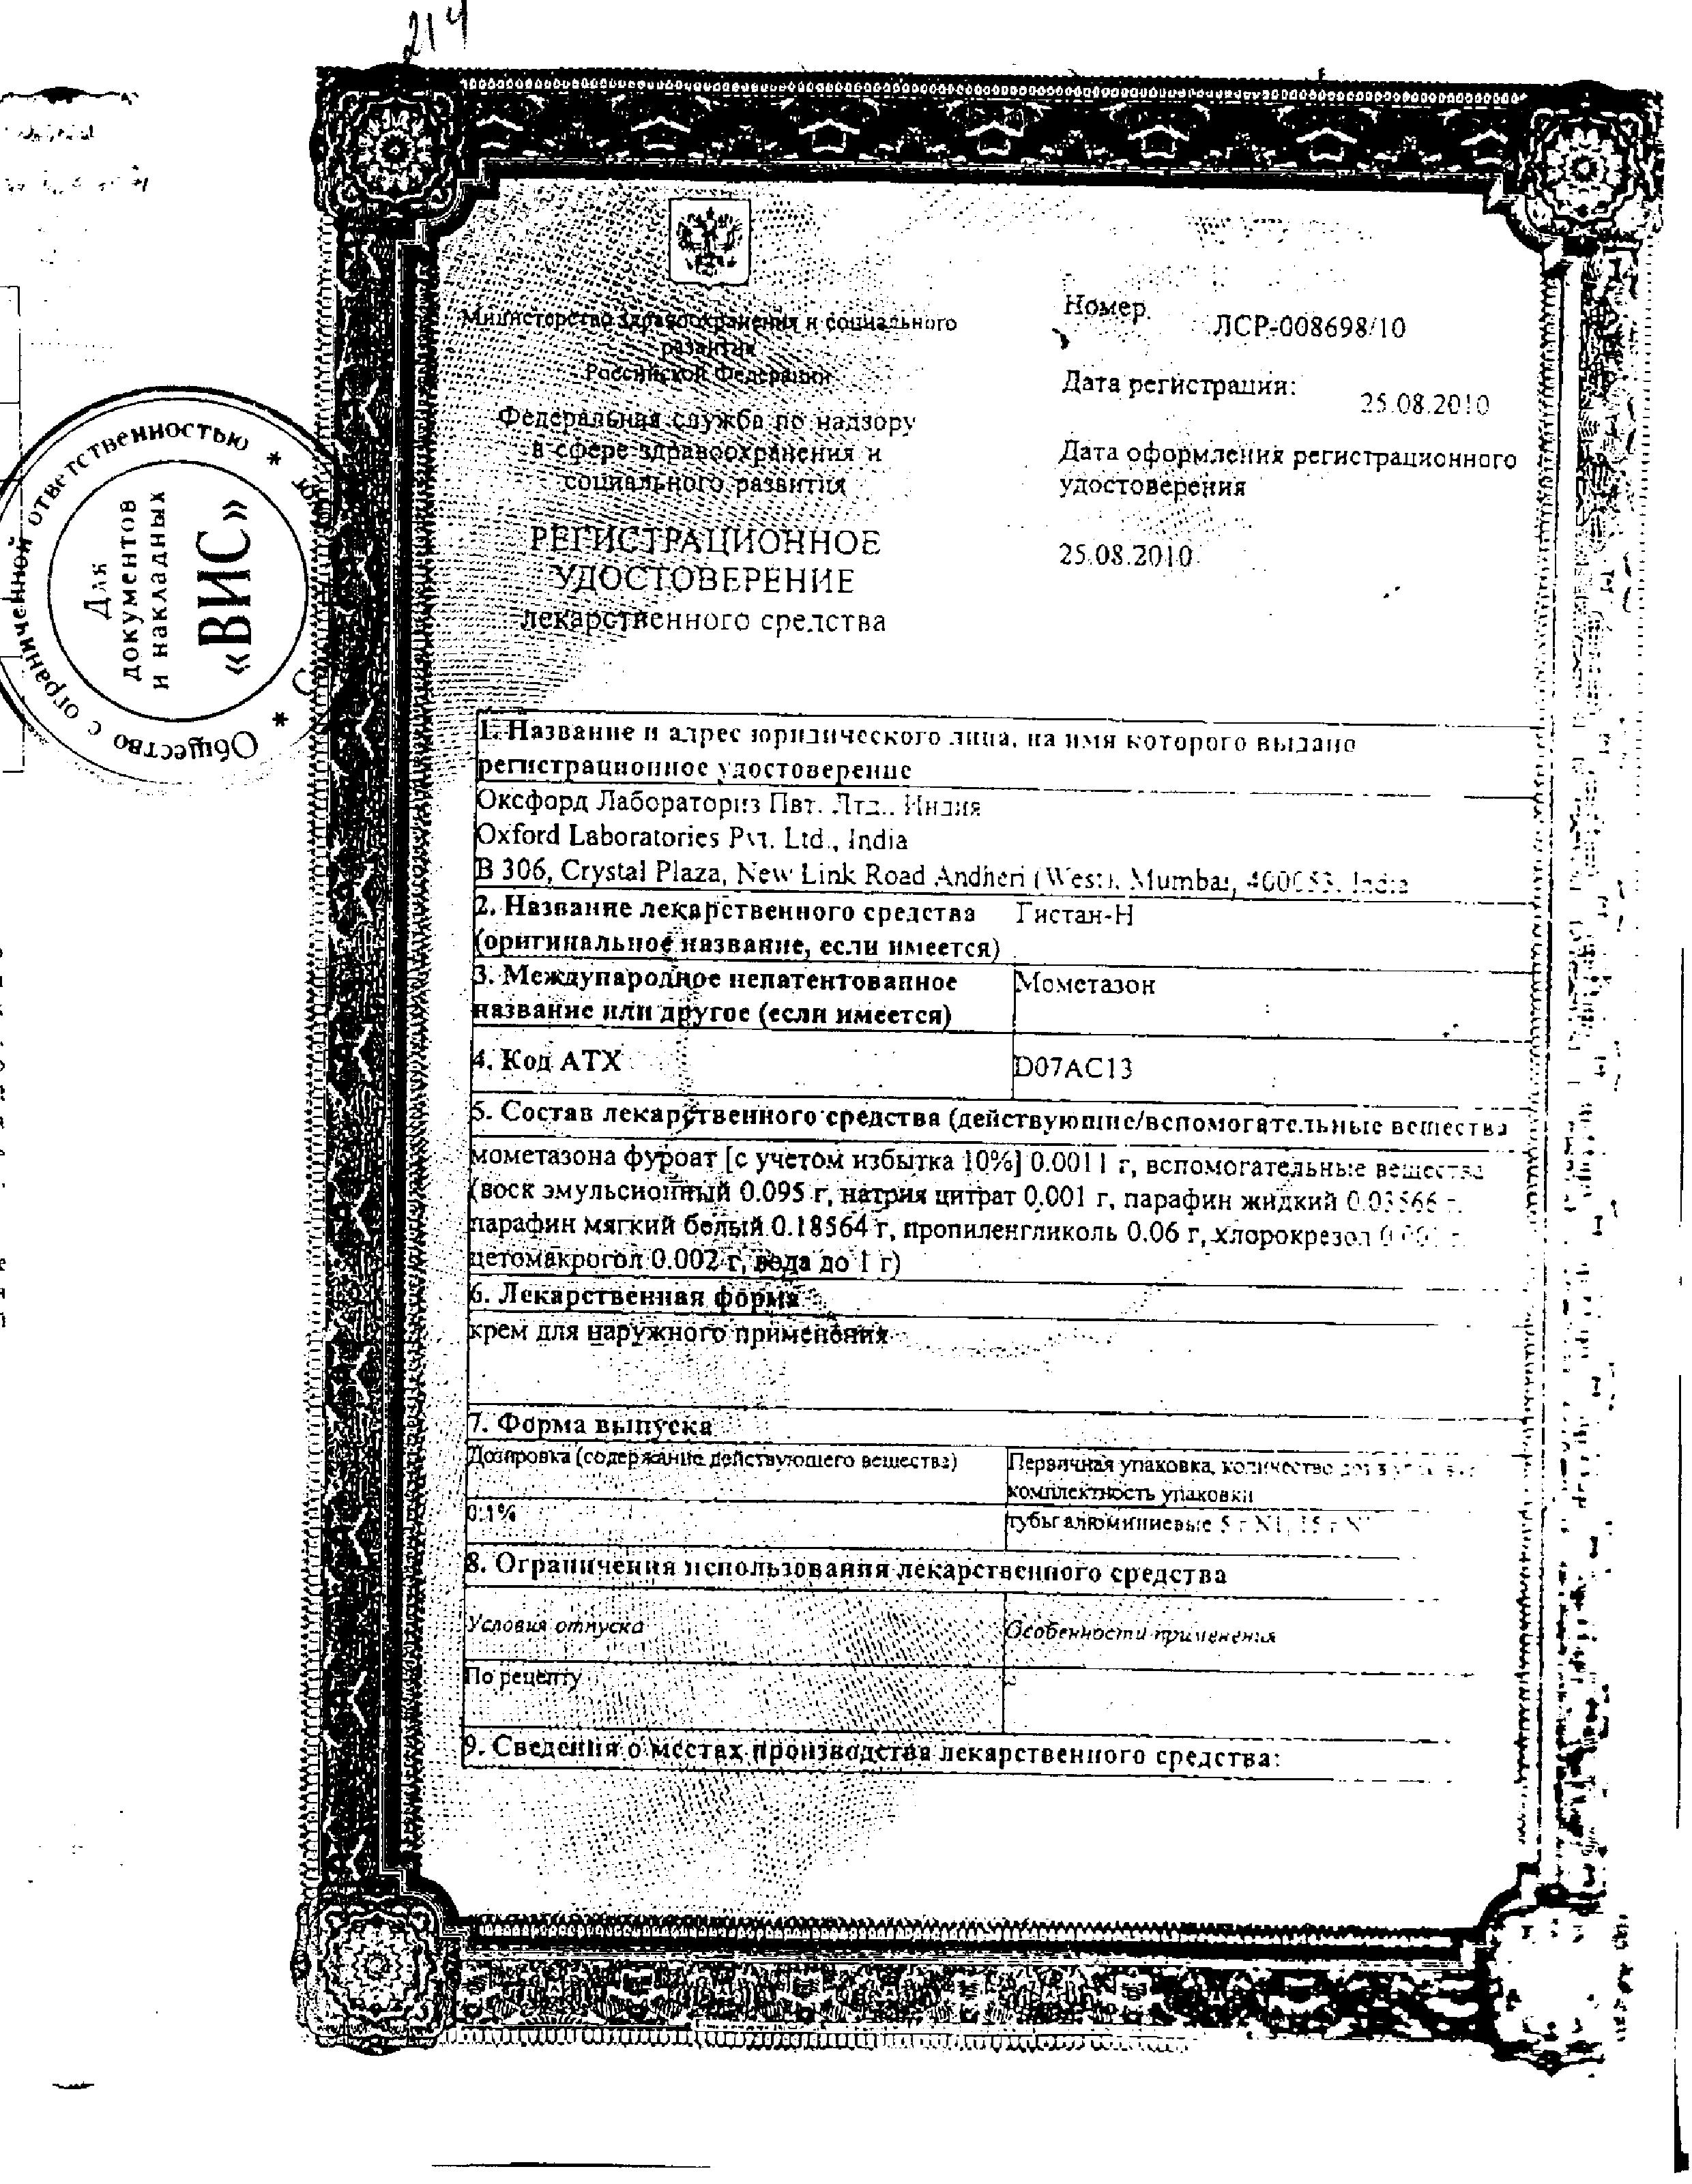 Гистан-Н сертификат